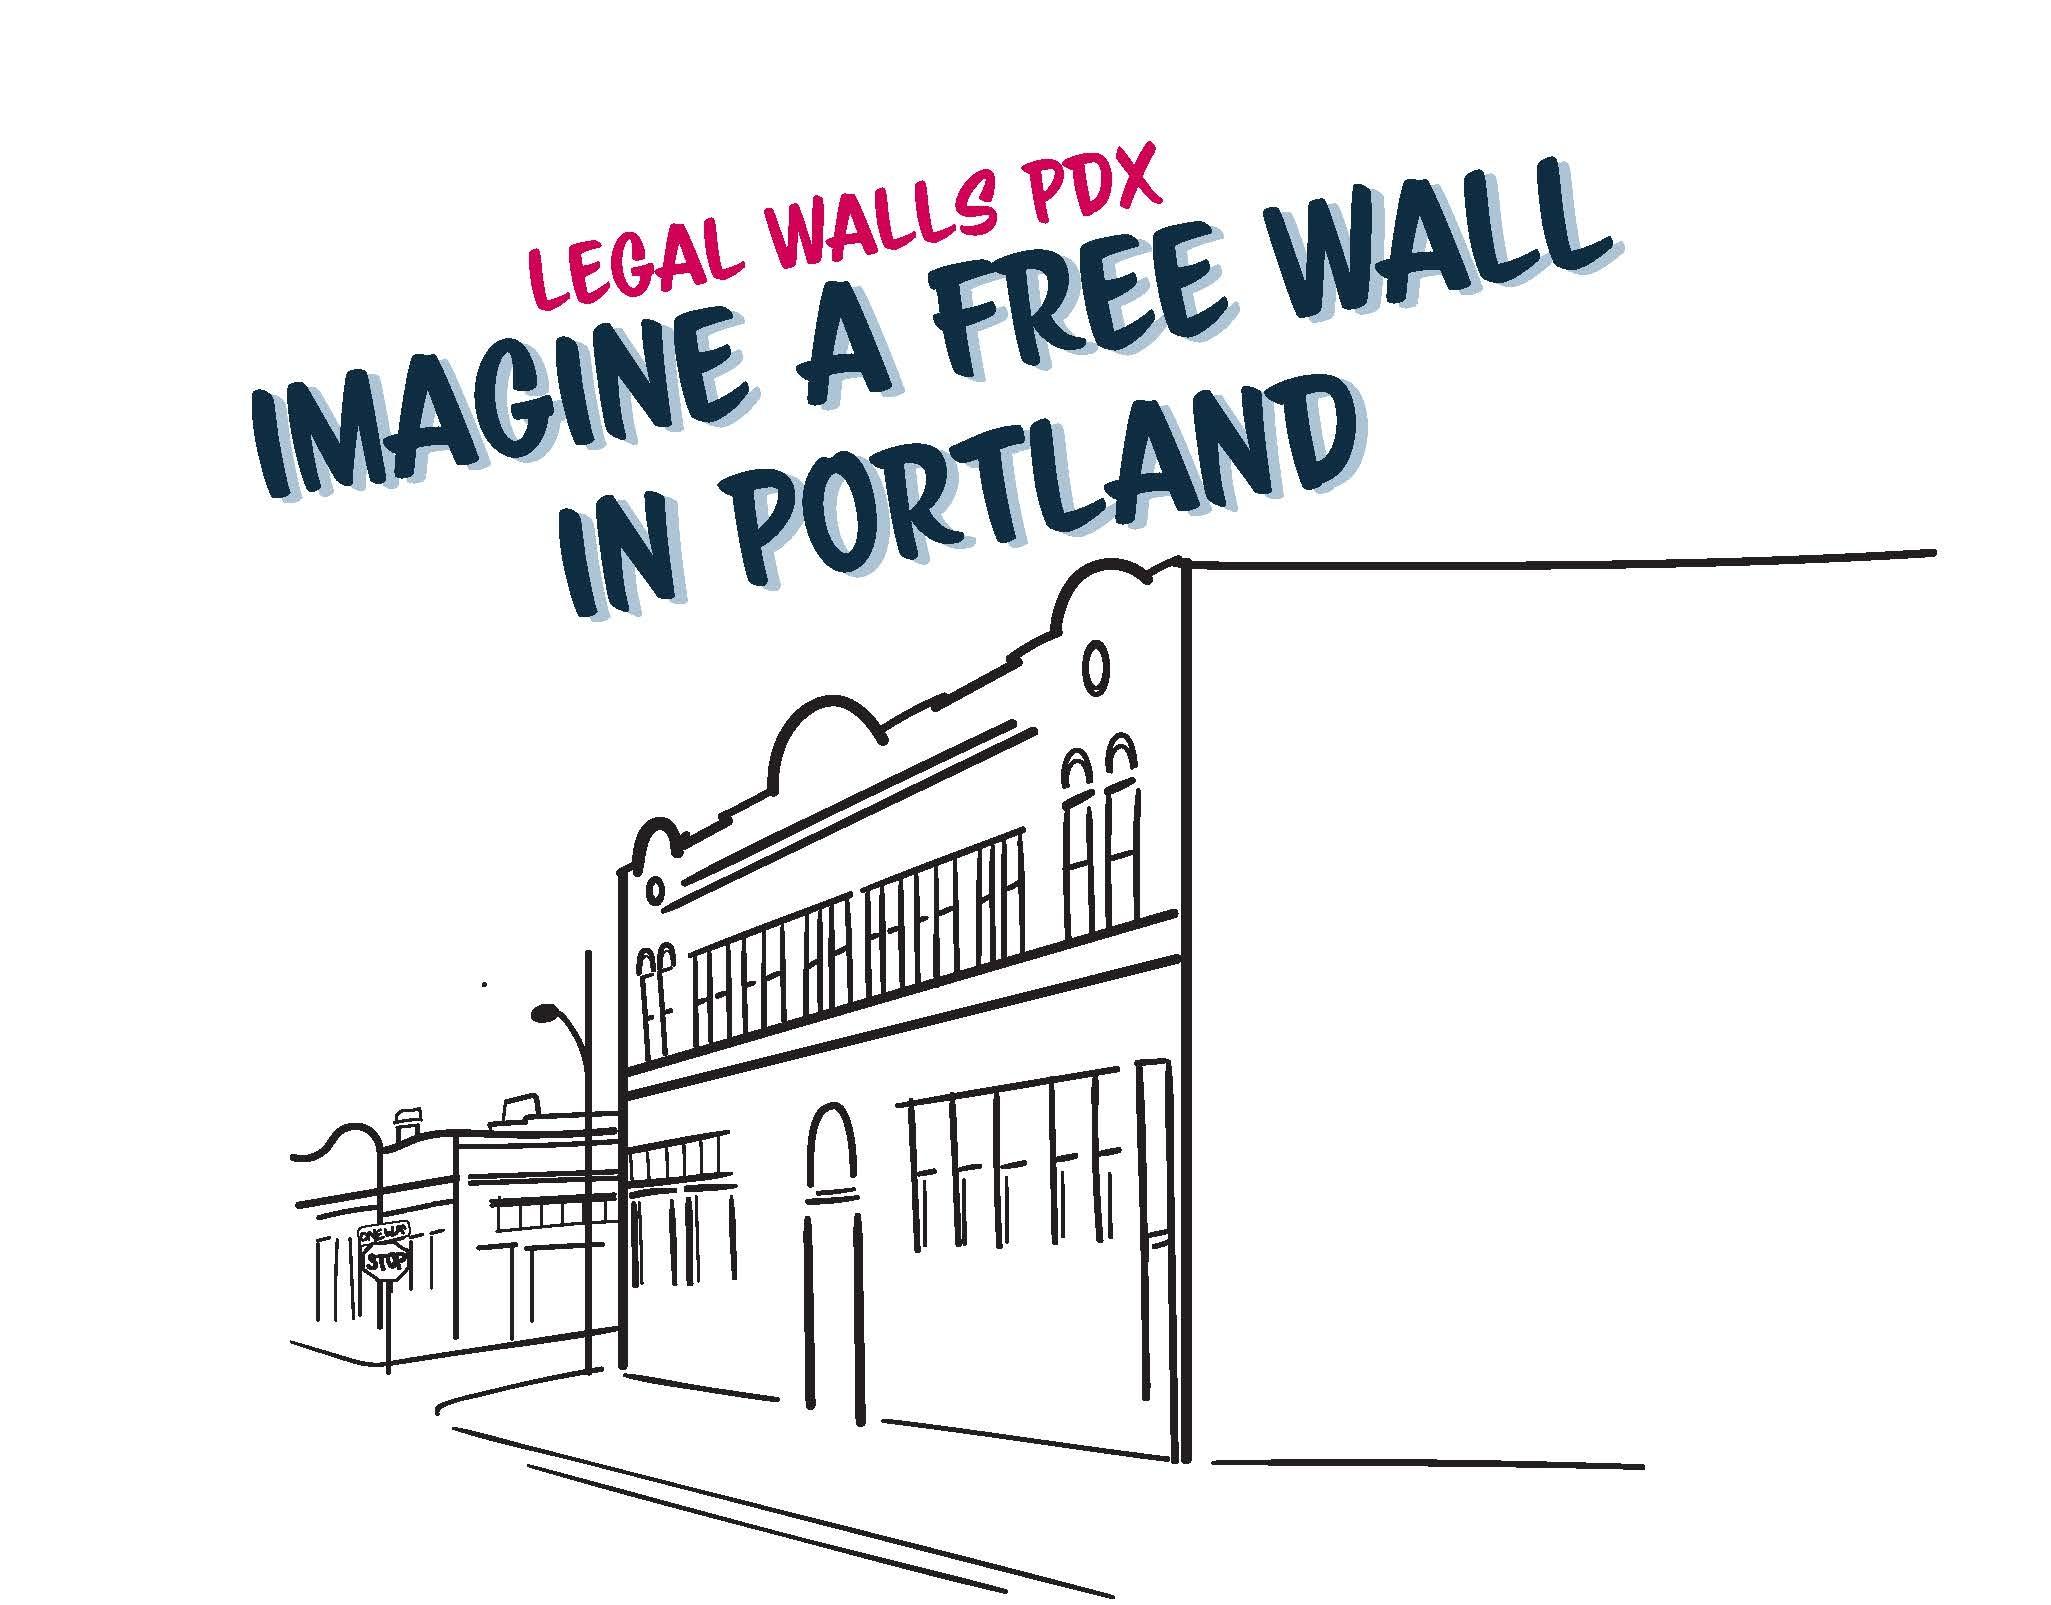 legalwalls_digitalfinal_06082019_Page_26.jpg